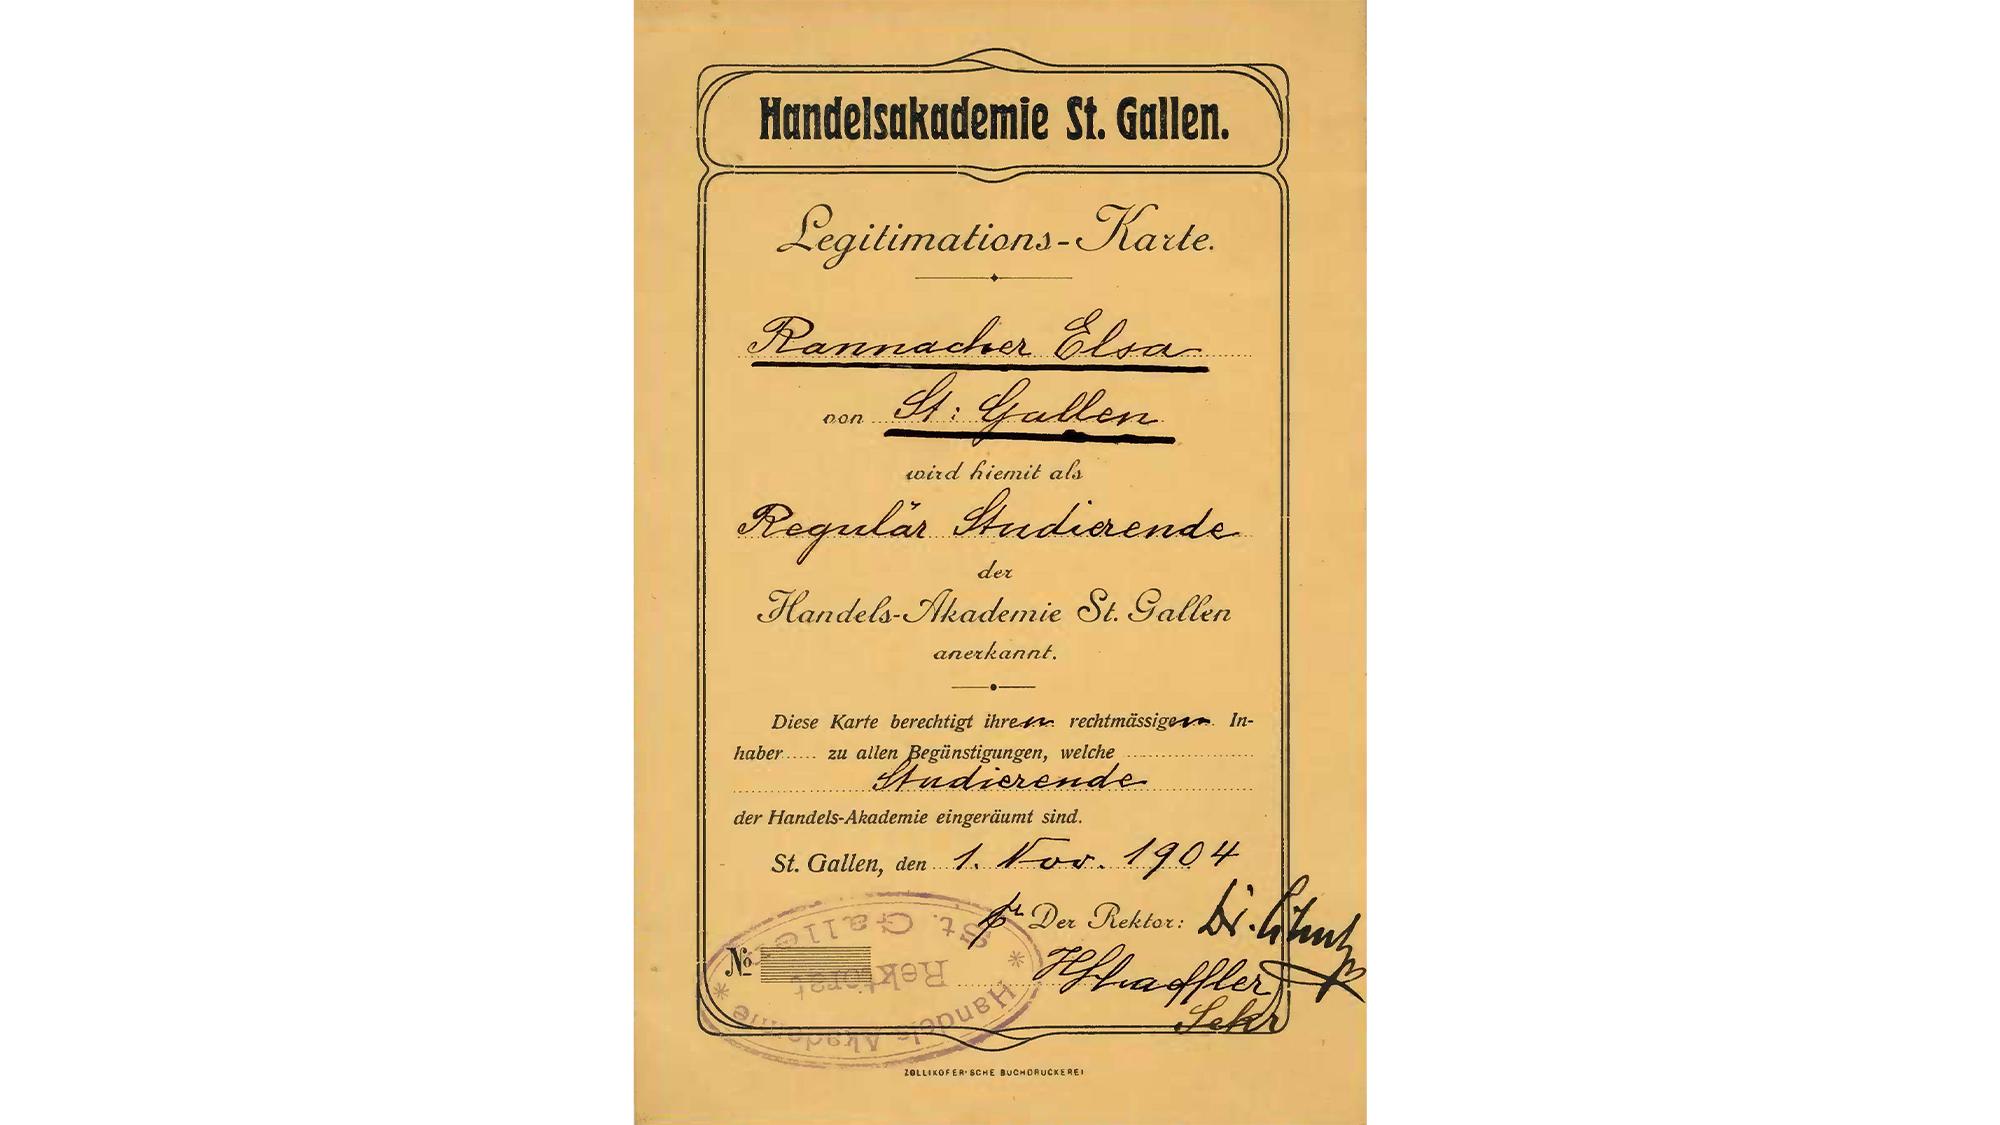 Elisabeth Rannacher - first graduate of the HSG